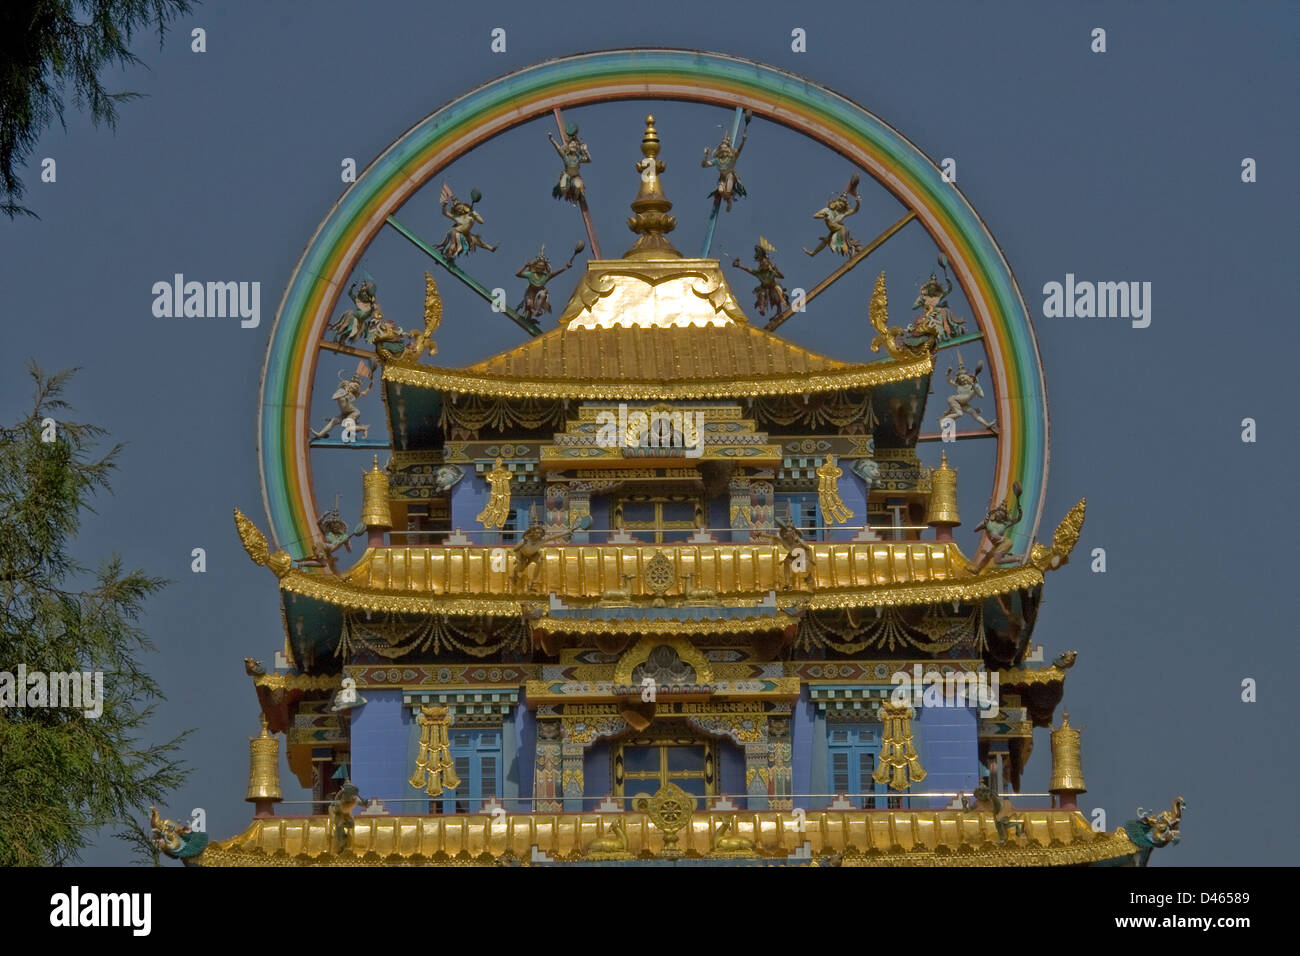 Namdroling Monastery (Golden Temple), Bylakuppe, near Kushalnagar, Mysore District, Karnataka, India, Asia Stock Photo